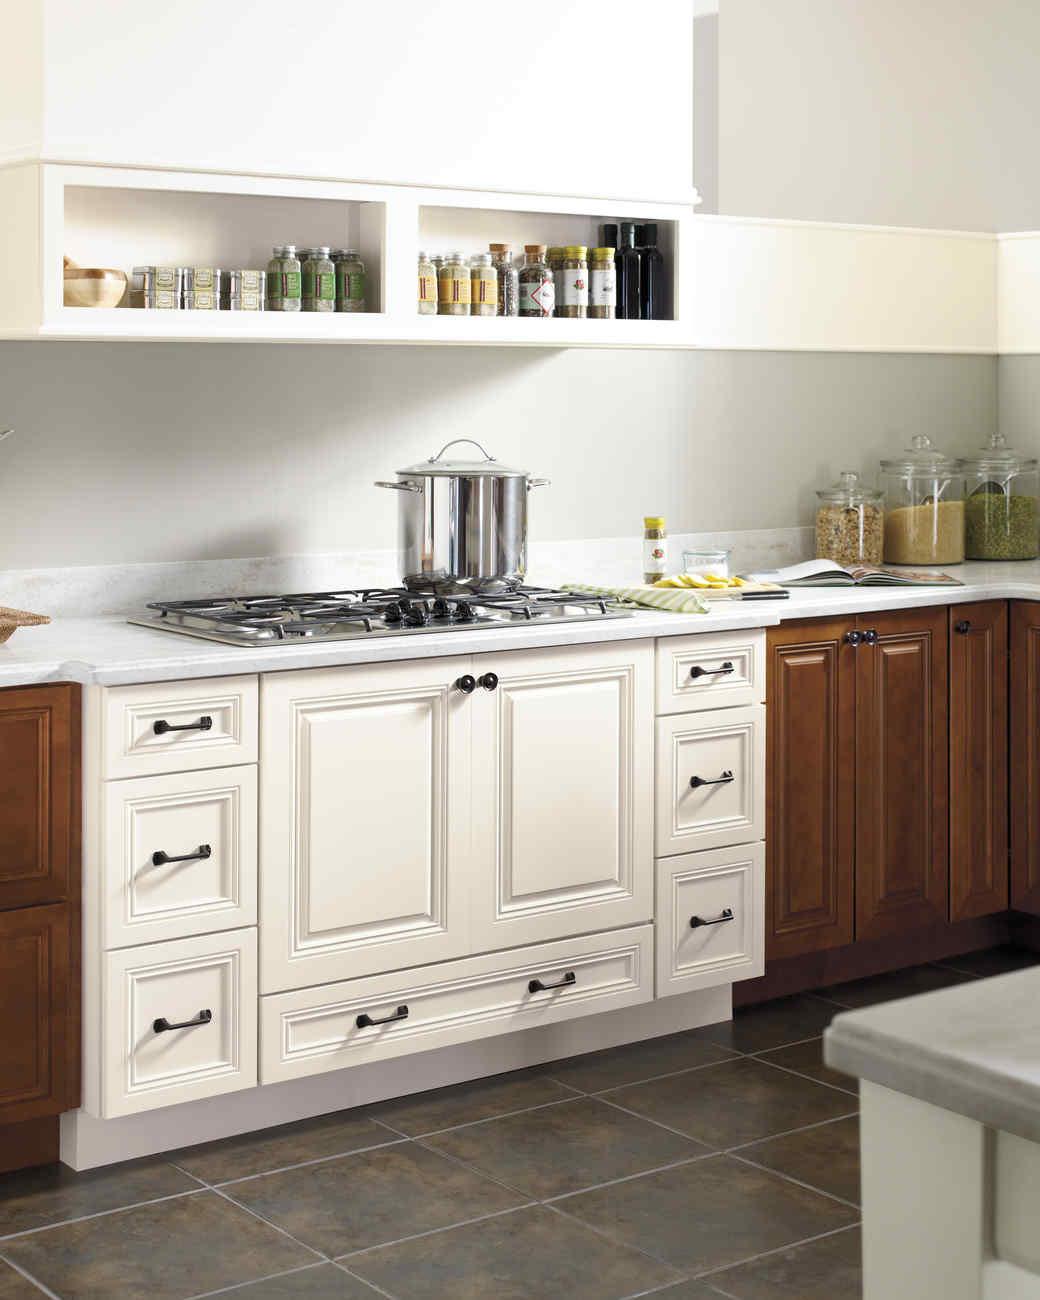 Martha Stewart Living Kitchen Designs from The Home Depot ...